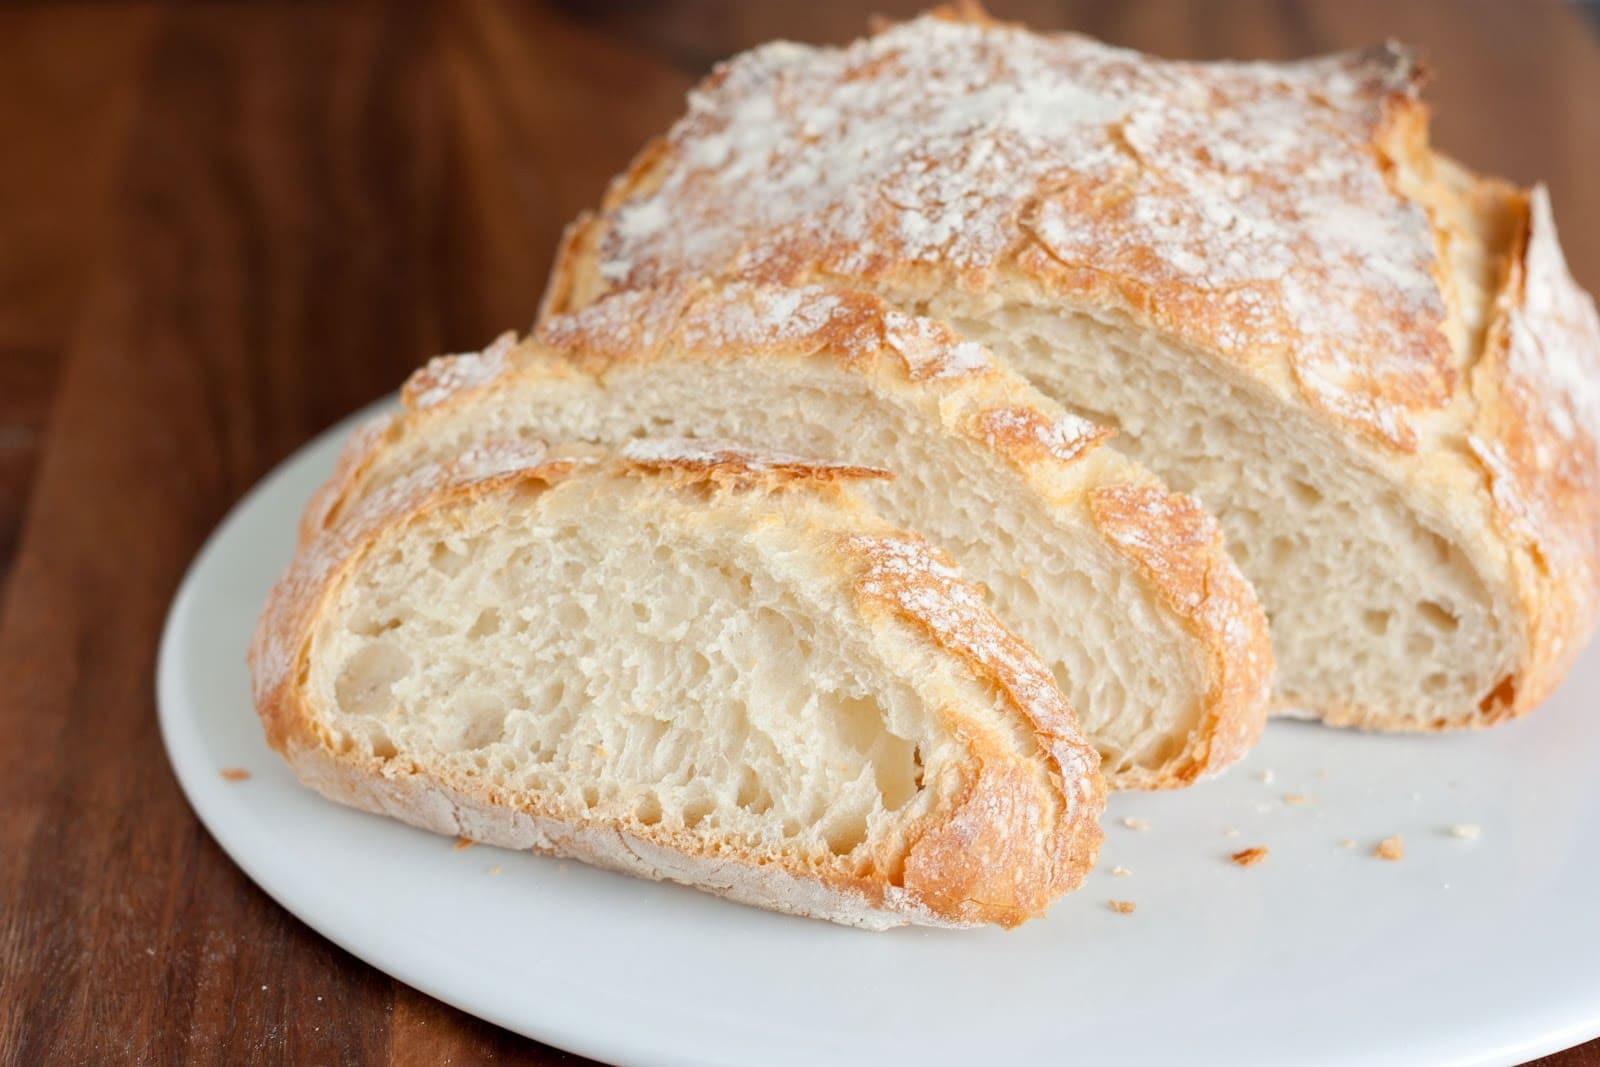 Bread Recipe No Yeast  Crusty Rustic Bread It s No Knead  Cooking Classy